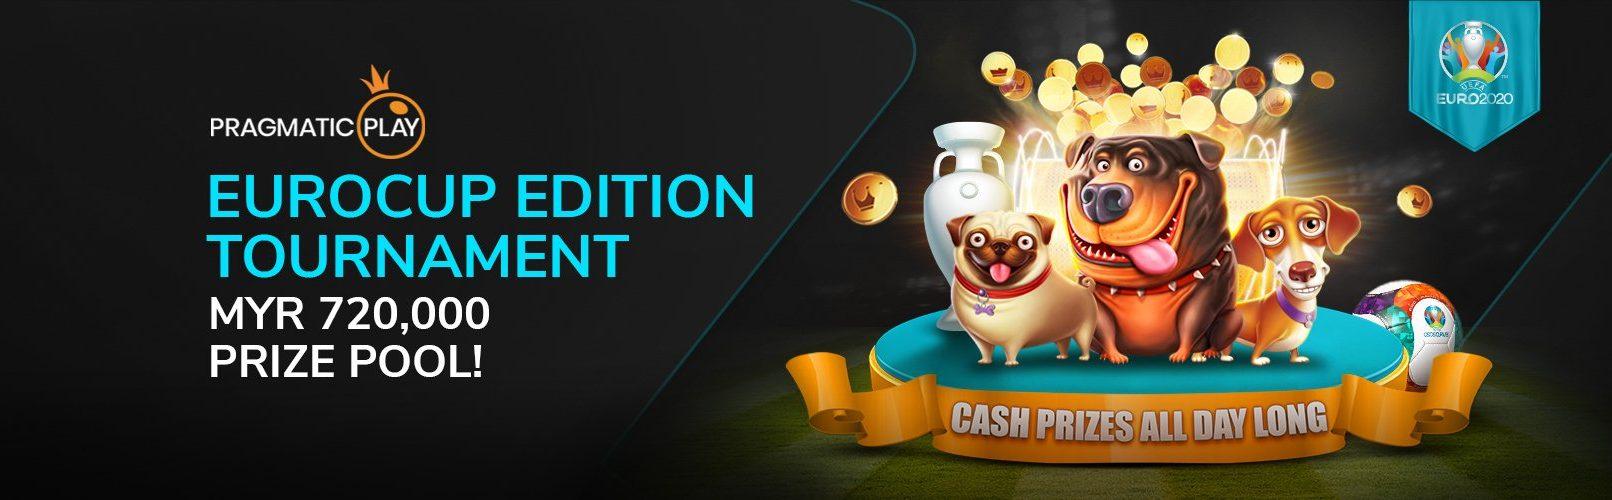 trusted online casino malaysia 2021